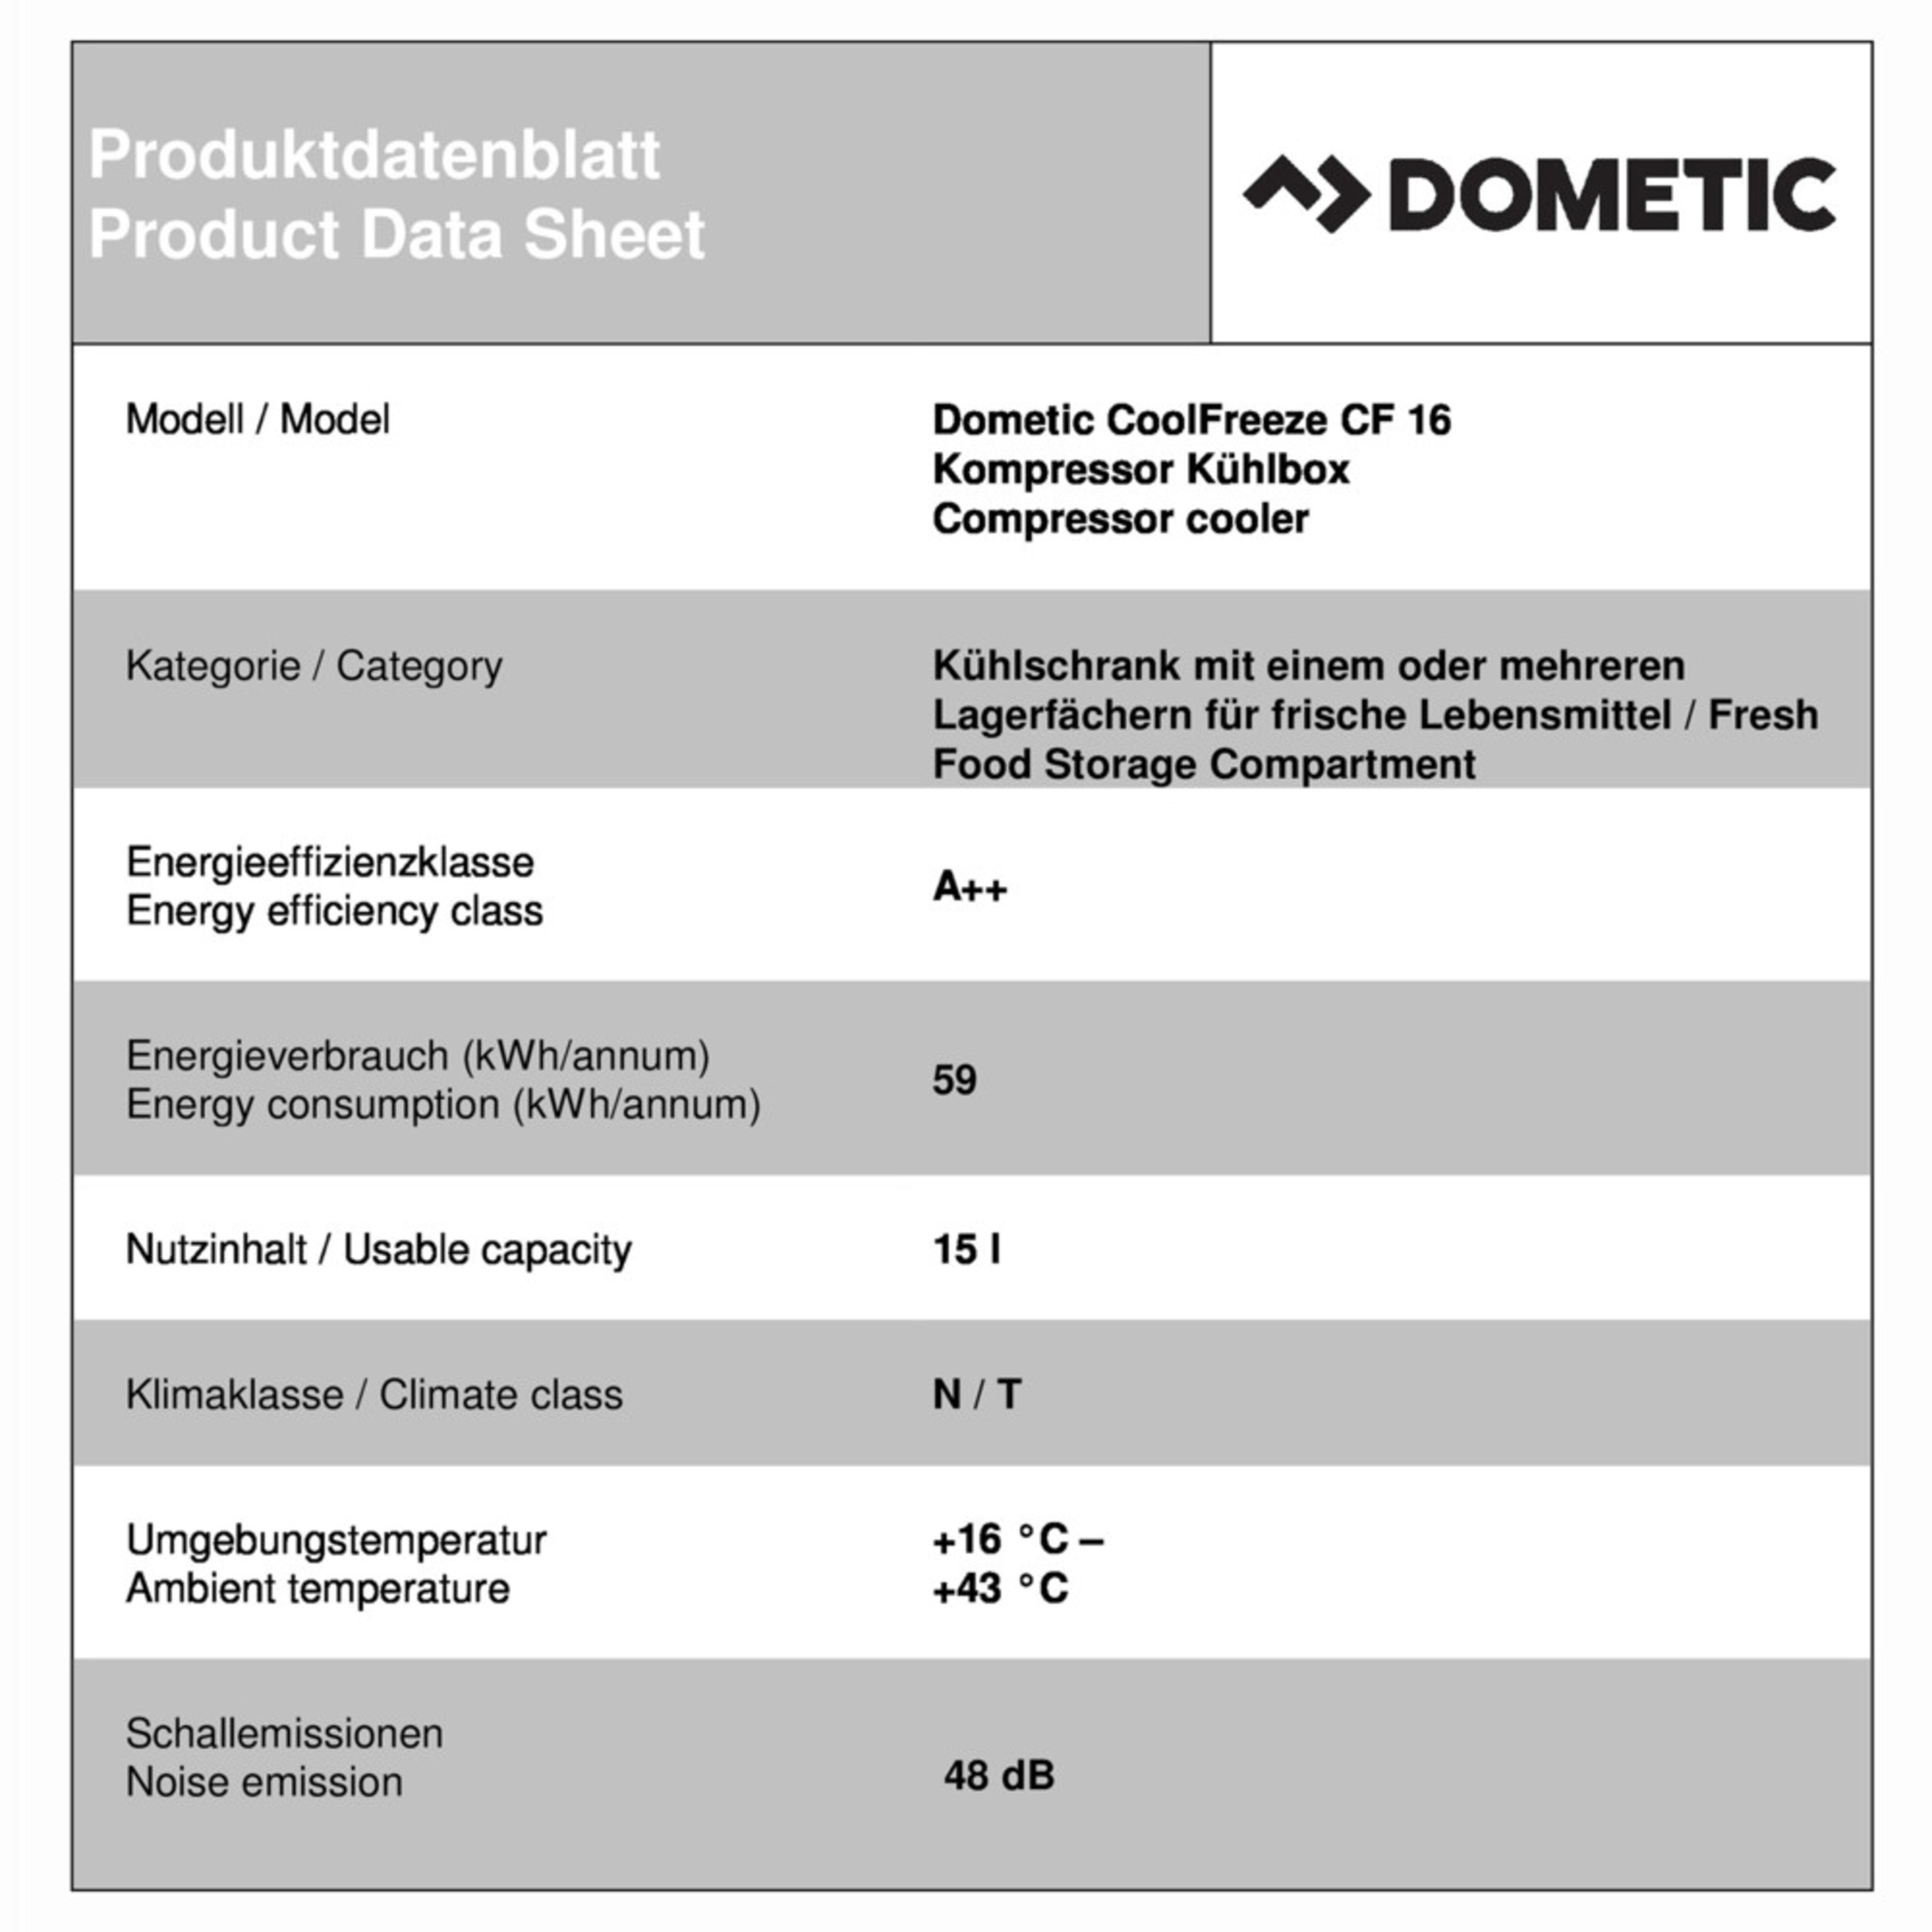 Dometic CoolFreeze CF 16 Productkaart